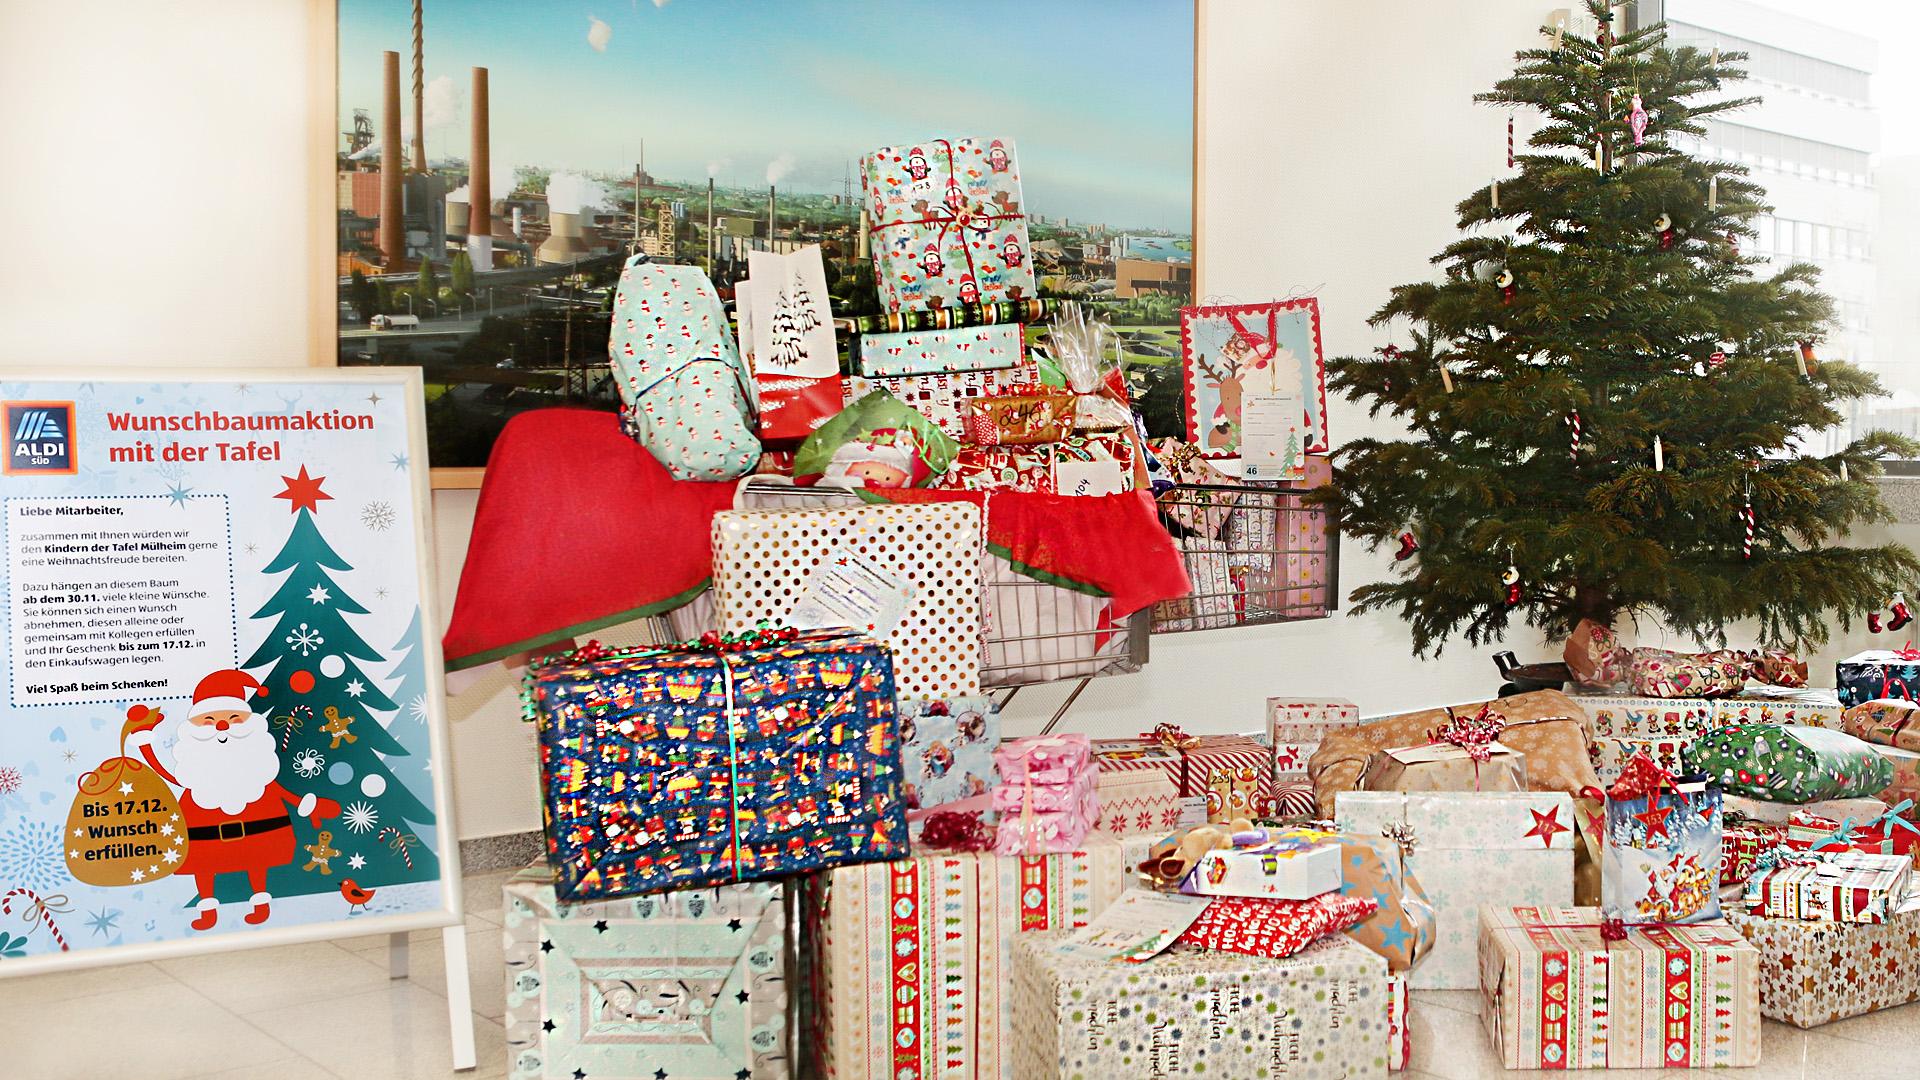 weihnachtsaktion bei aldi s d geschenke f r kinder in not. Black Bedroom Furniture Sets. Home Design Ideas